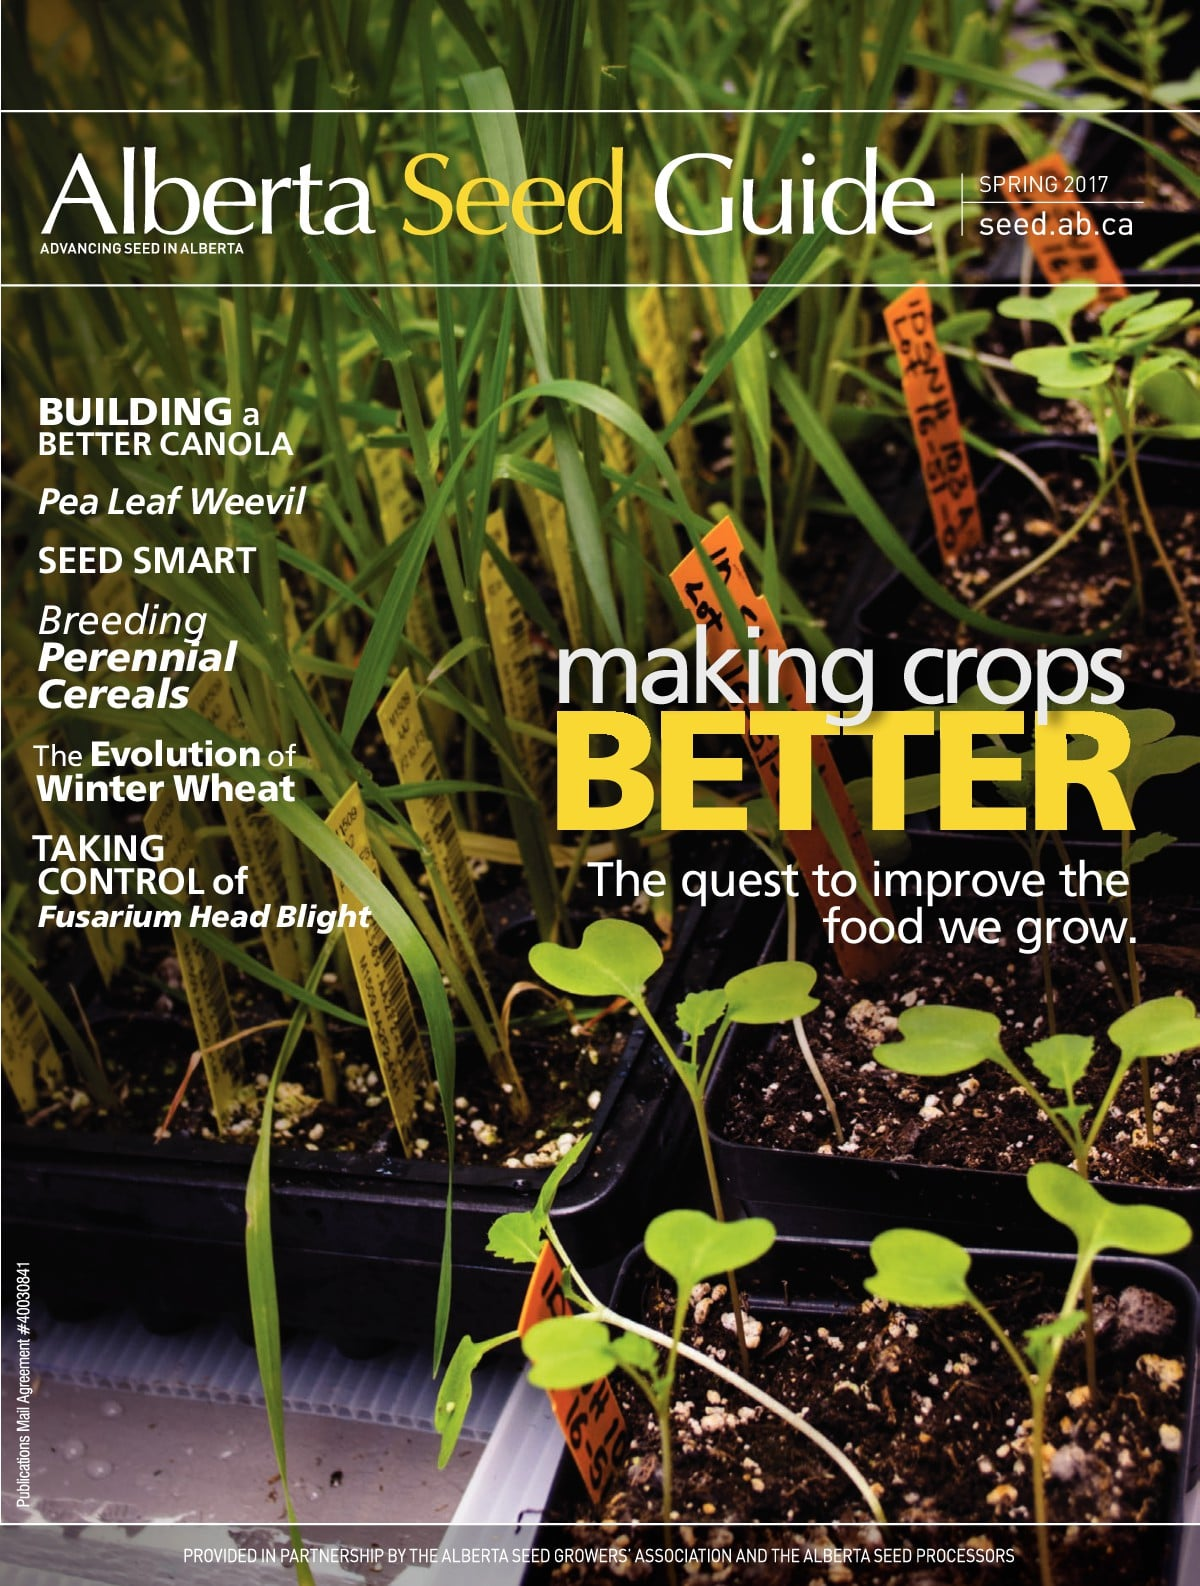 Spring 2017 – Making Crops Better